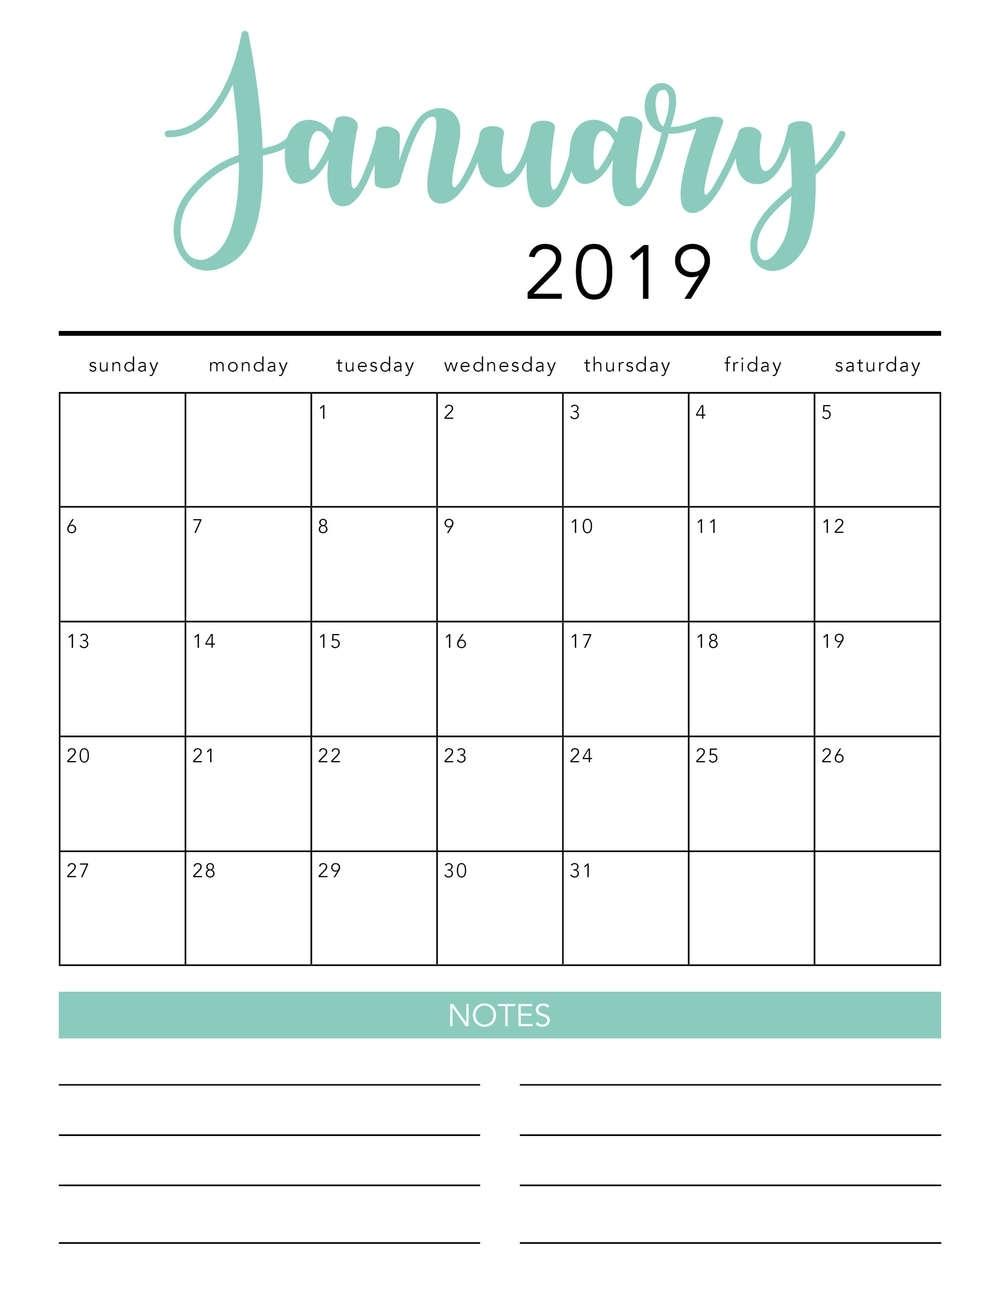 Free 2019 Printable Calendar Template (2 Colors!) - I